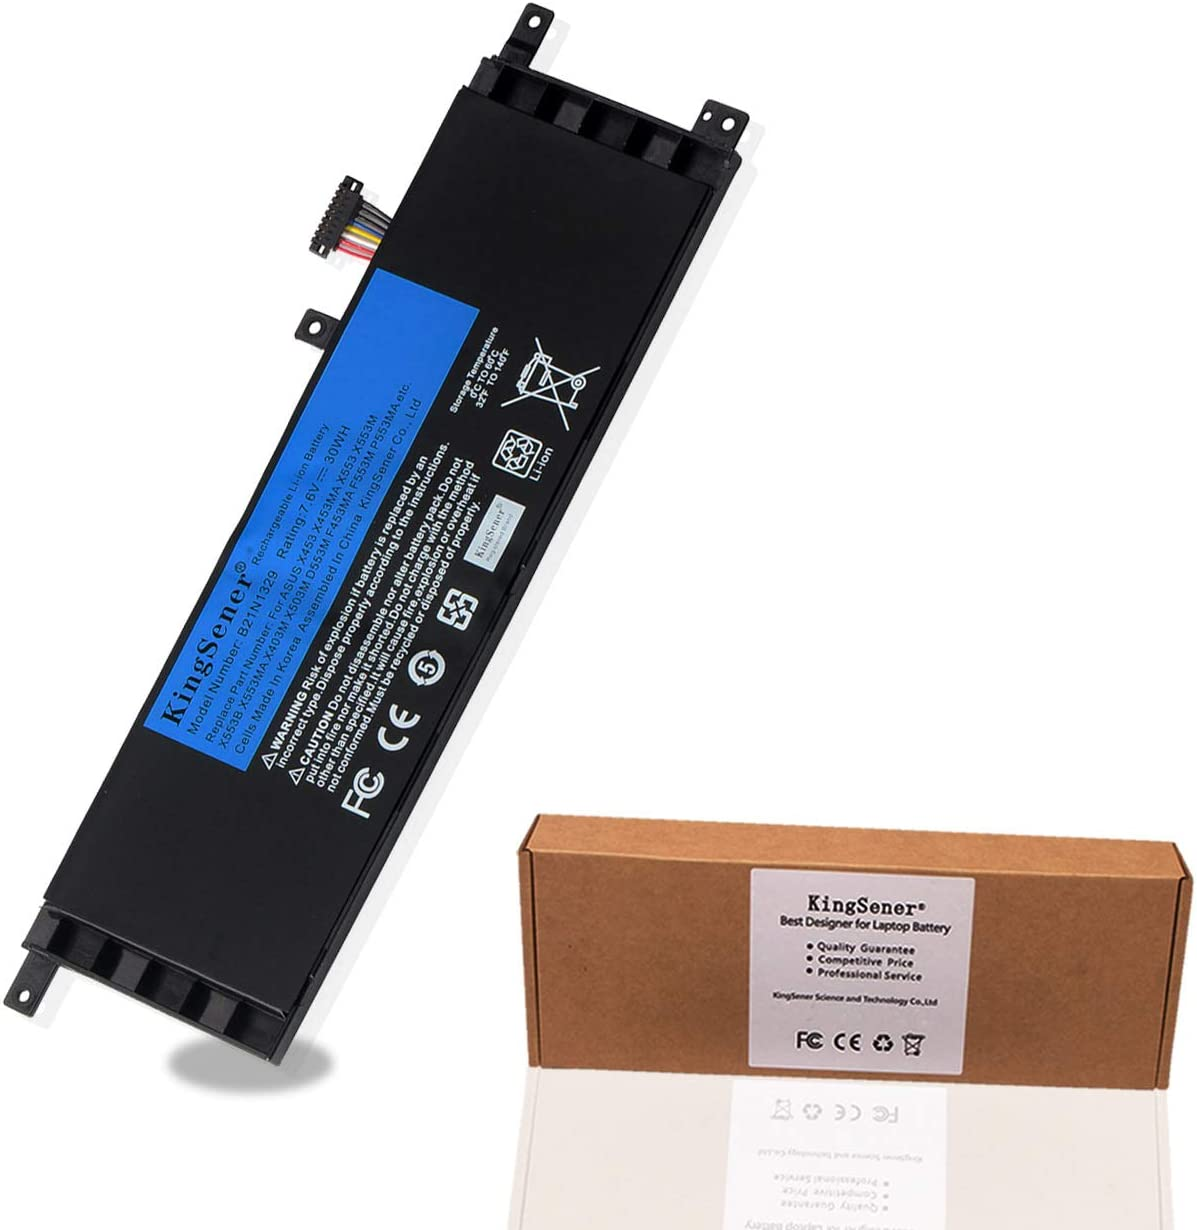 KingSener B21N1329 Laptop Battery for ASUS D553M F453 F453MA F553M P553 P553MA X453 X453MA X553 X553M X553B X553MA X403M X503M 7.6V 30WH